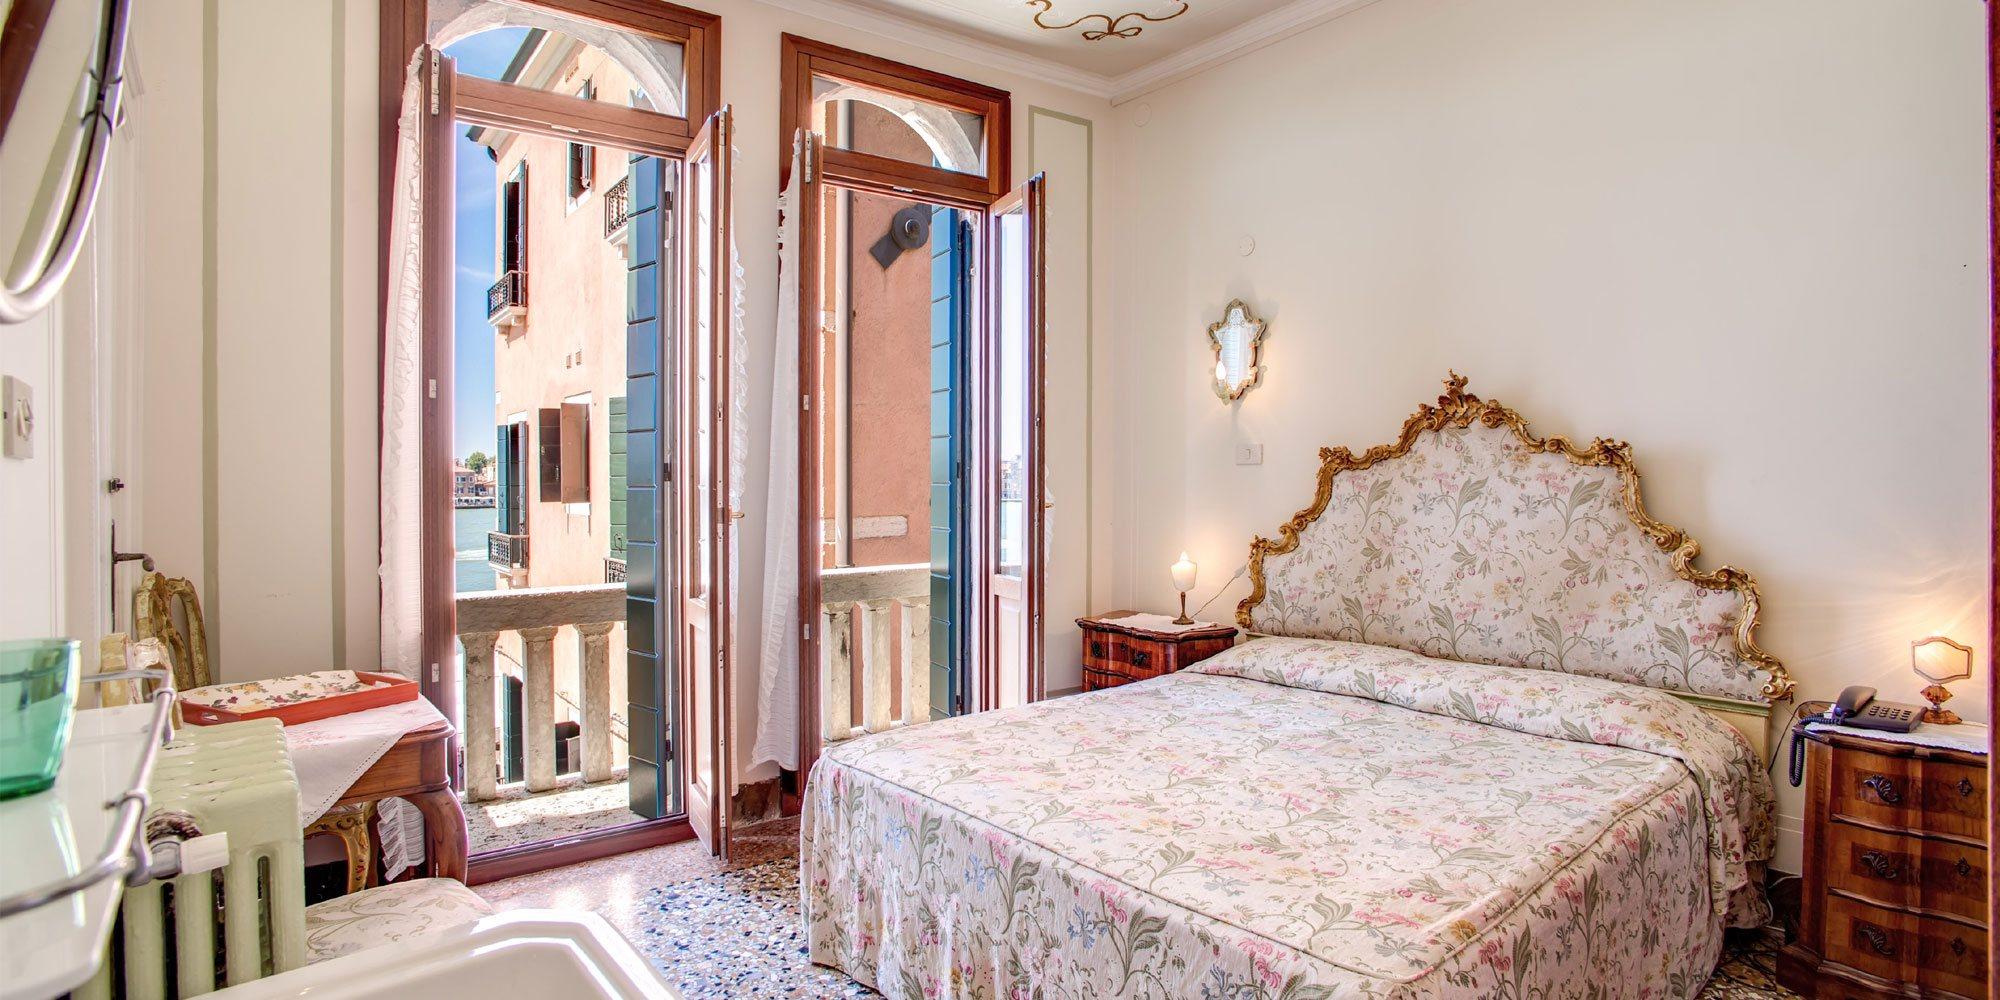 Hotel Venezia - Alberghi a Venezia, Italia